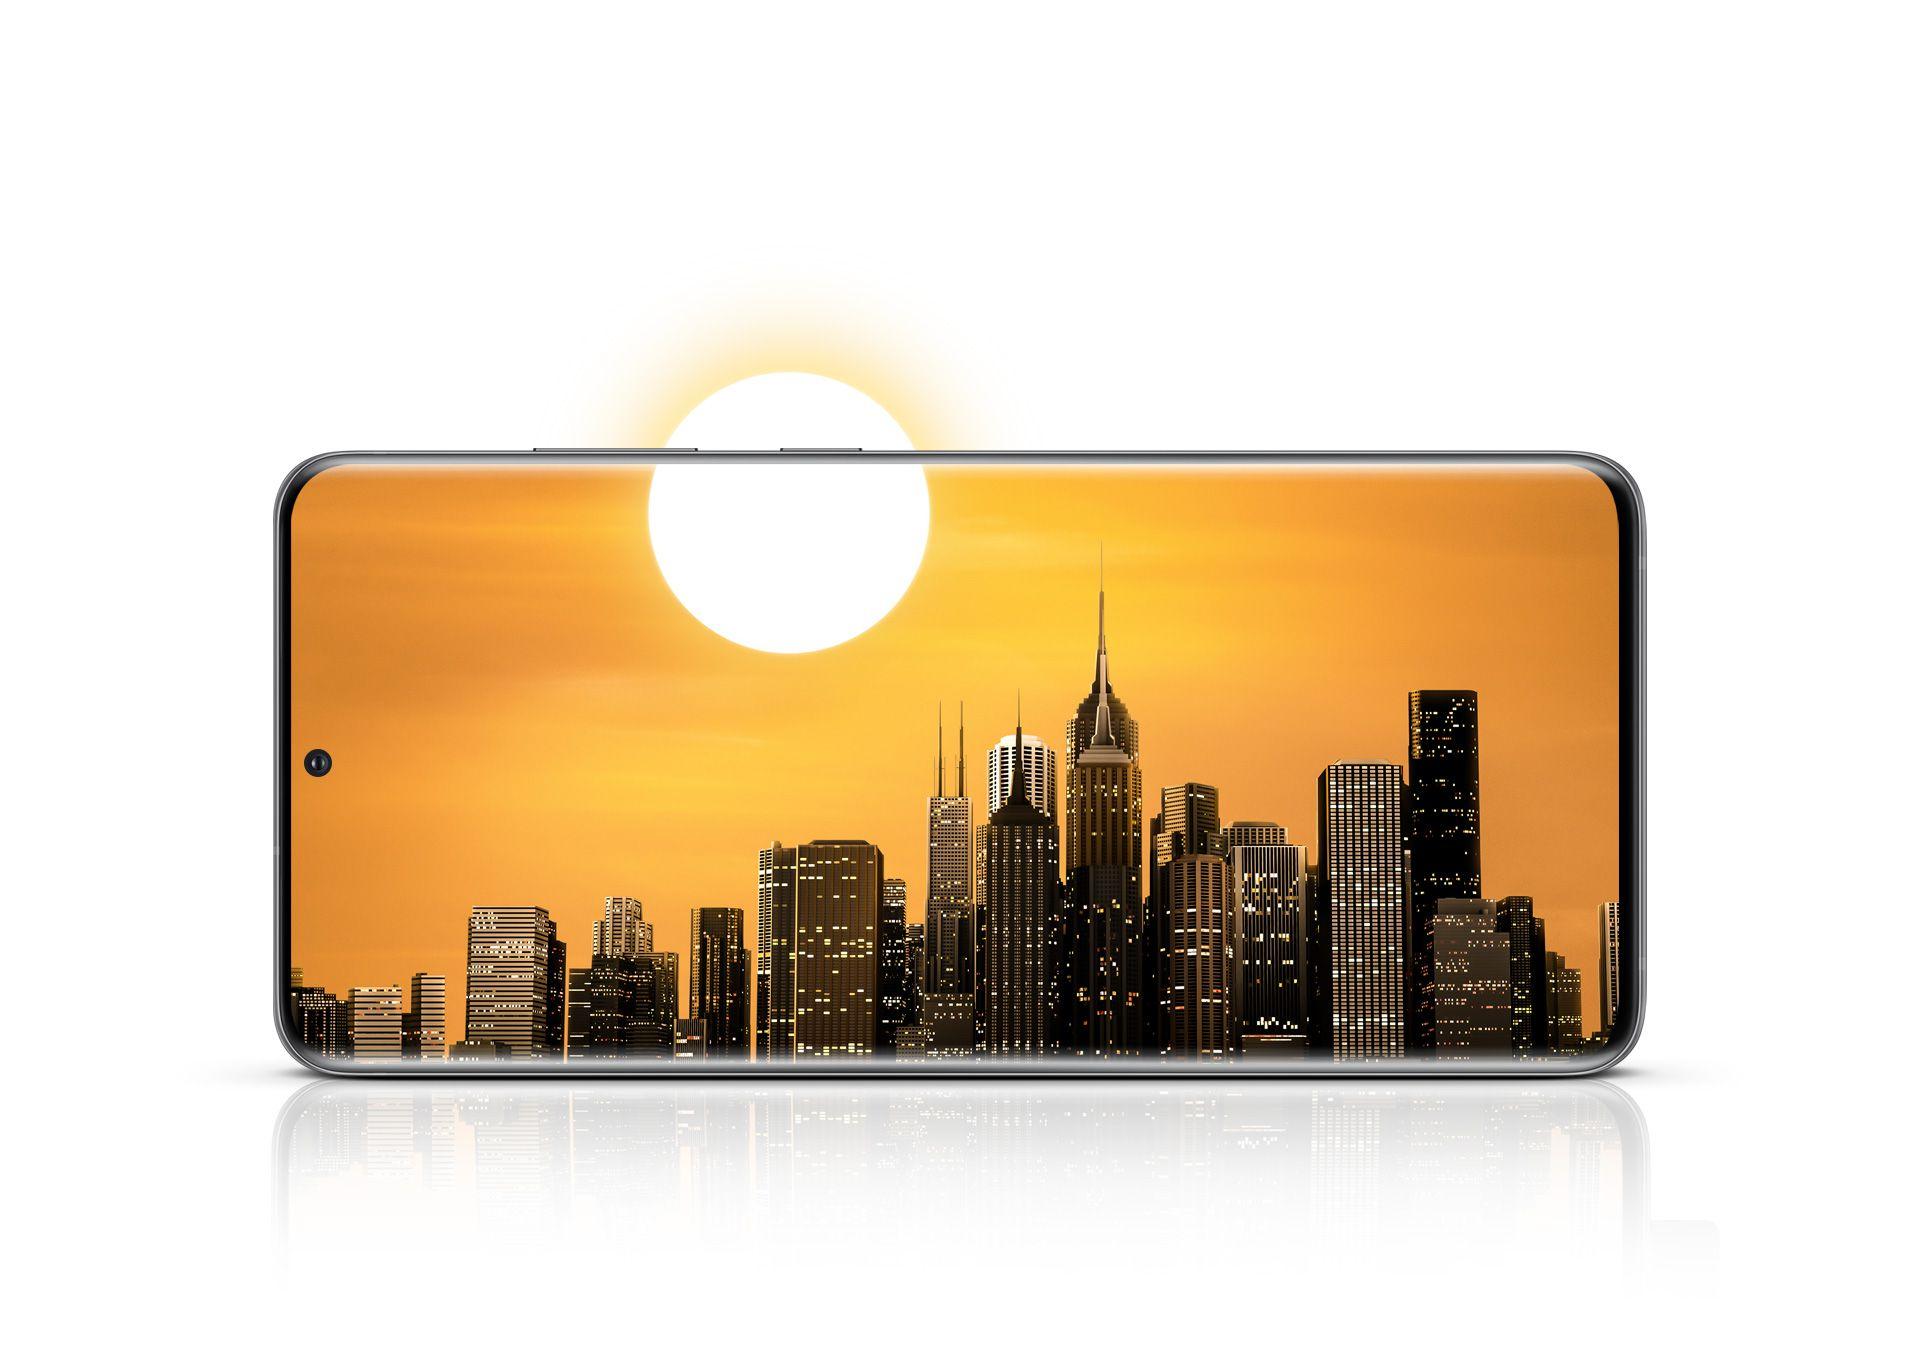 Samsung Galaxy S20 | S20 + | S20 Ultra 5G